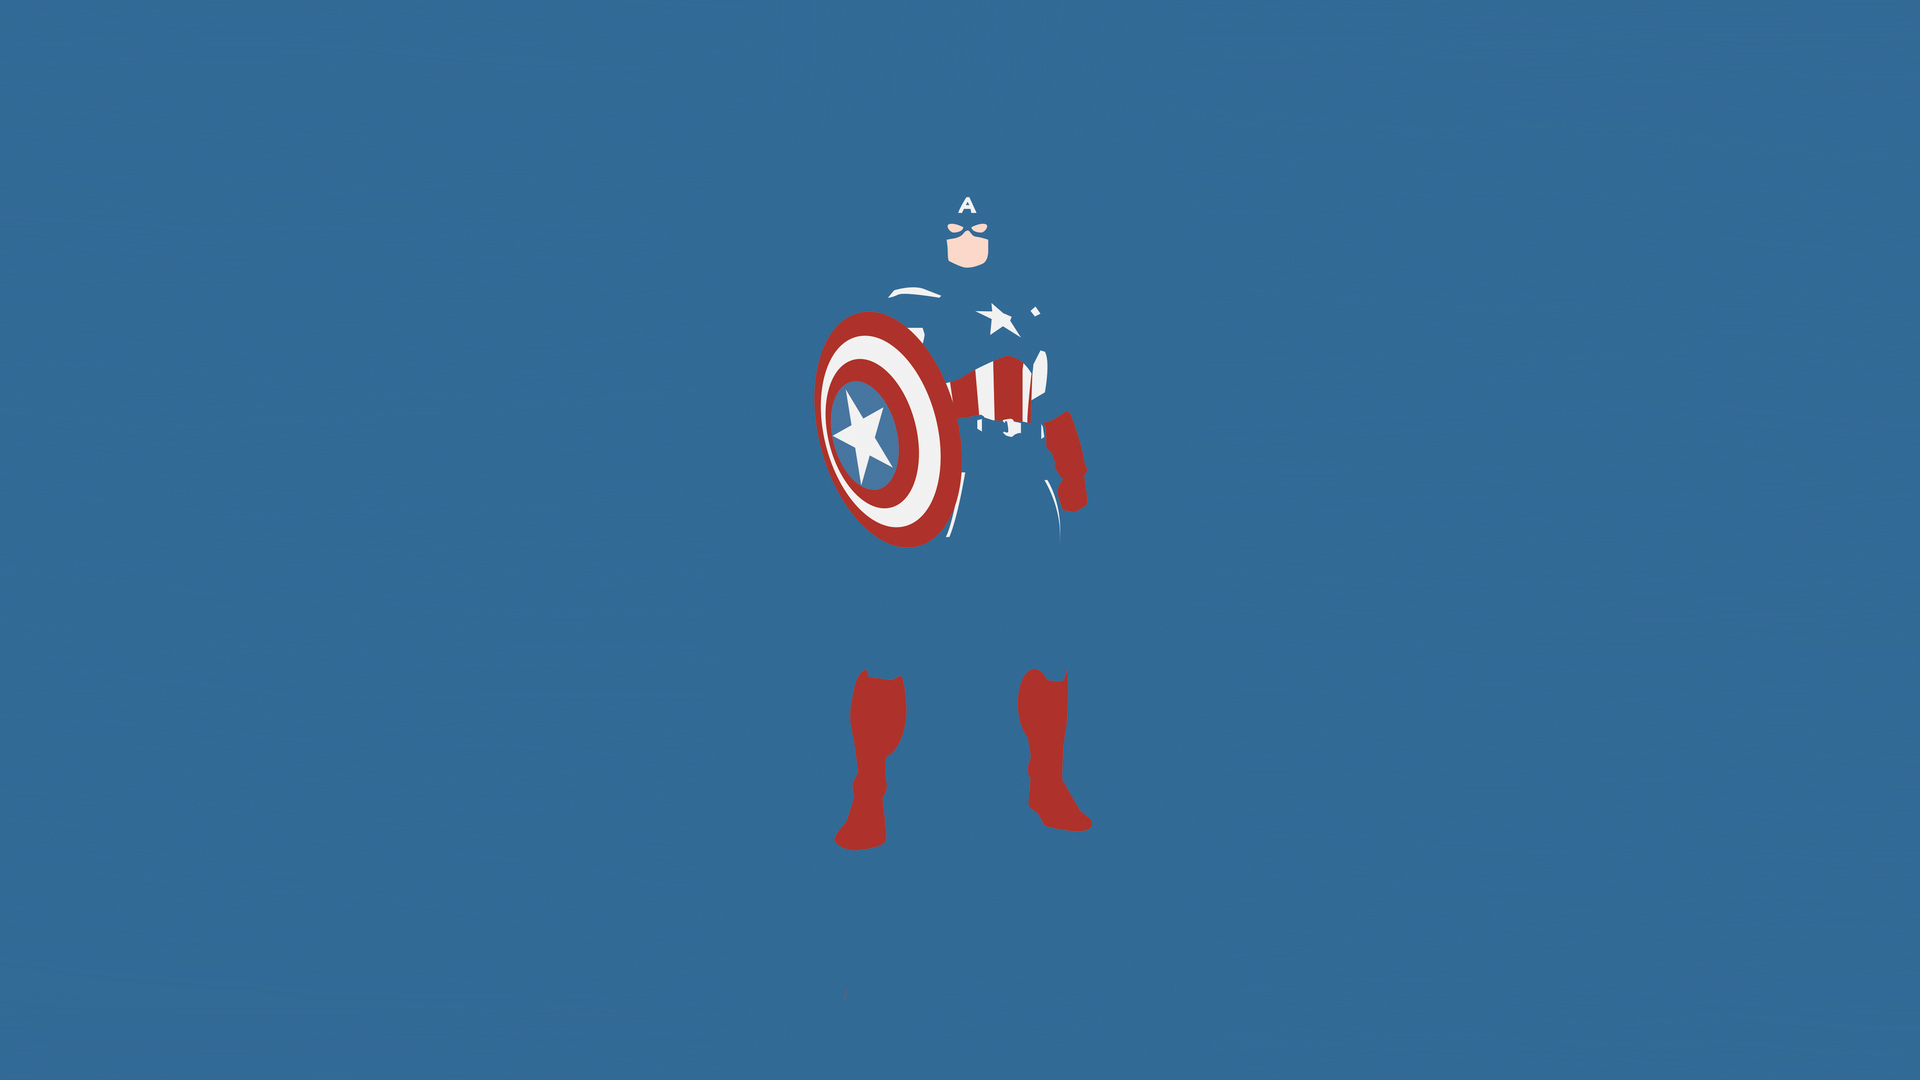 Captain Marvel Fantasy Art Wallpapers Hd Desktop And: Captain America Marvel Comics Minimalism, HD Artist, 4k